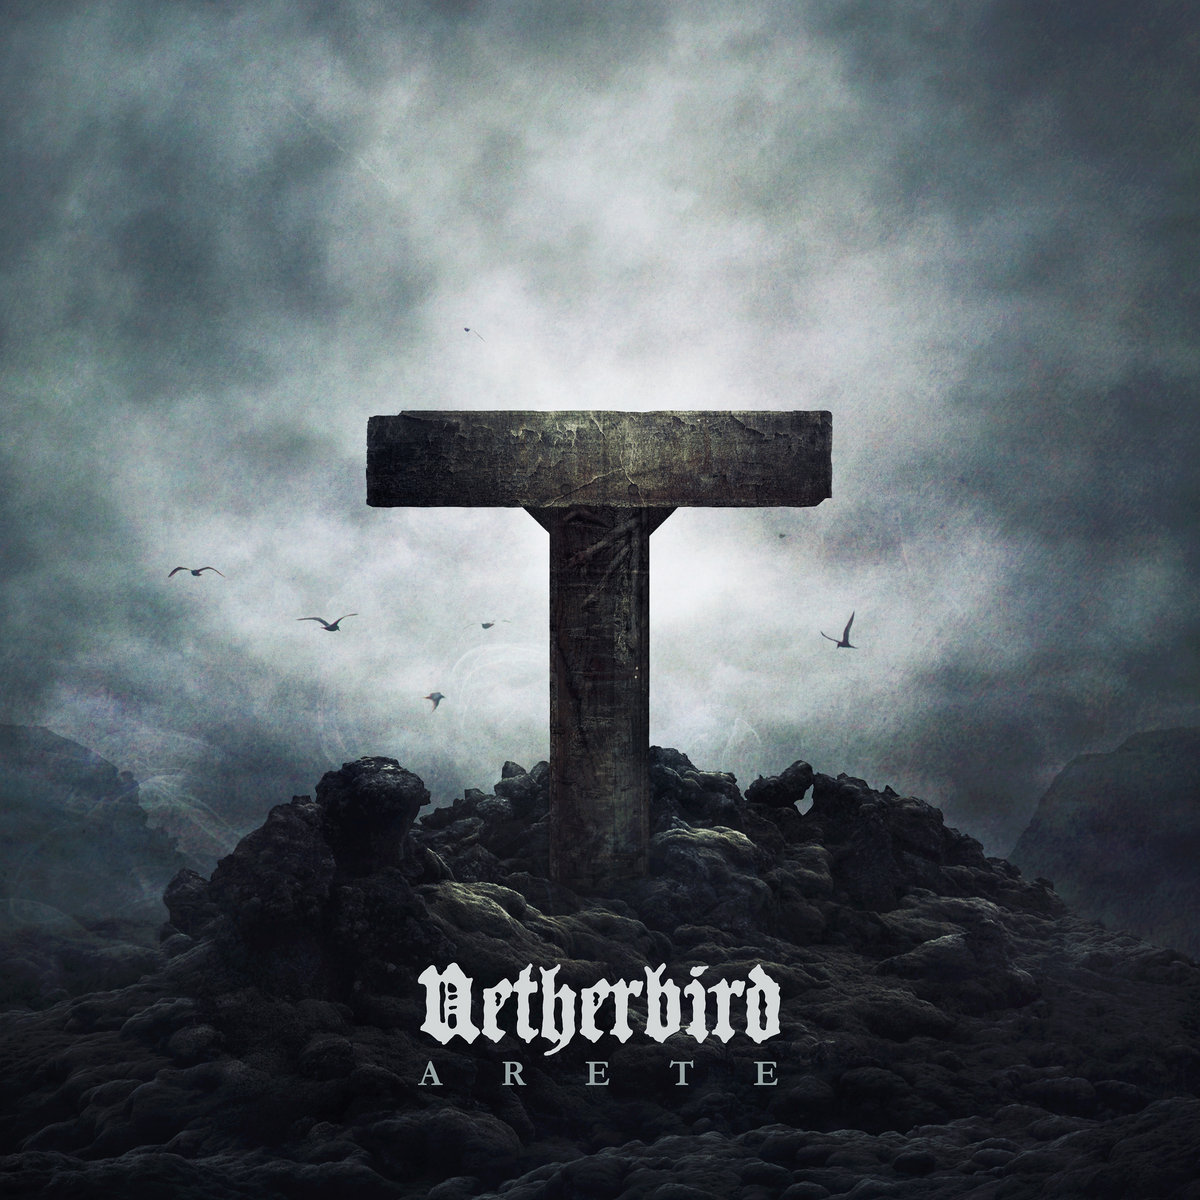 NETHERBIRD Arete Album Cover Artwork